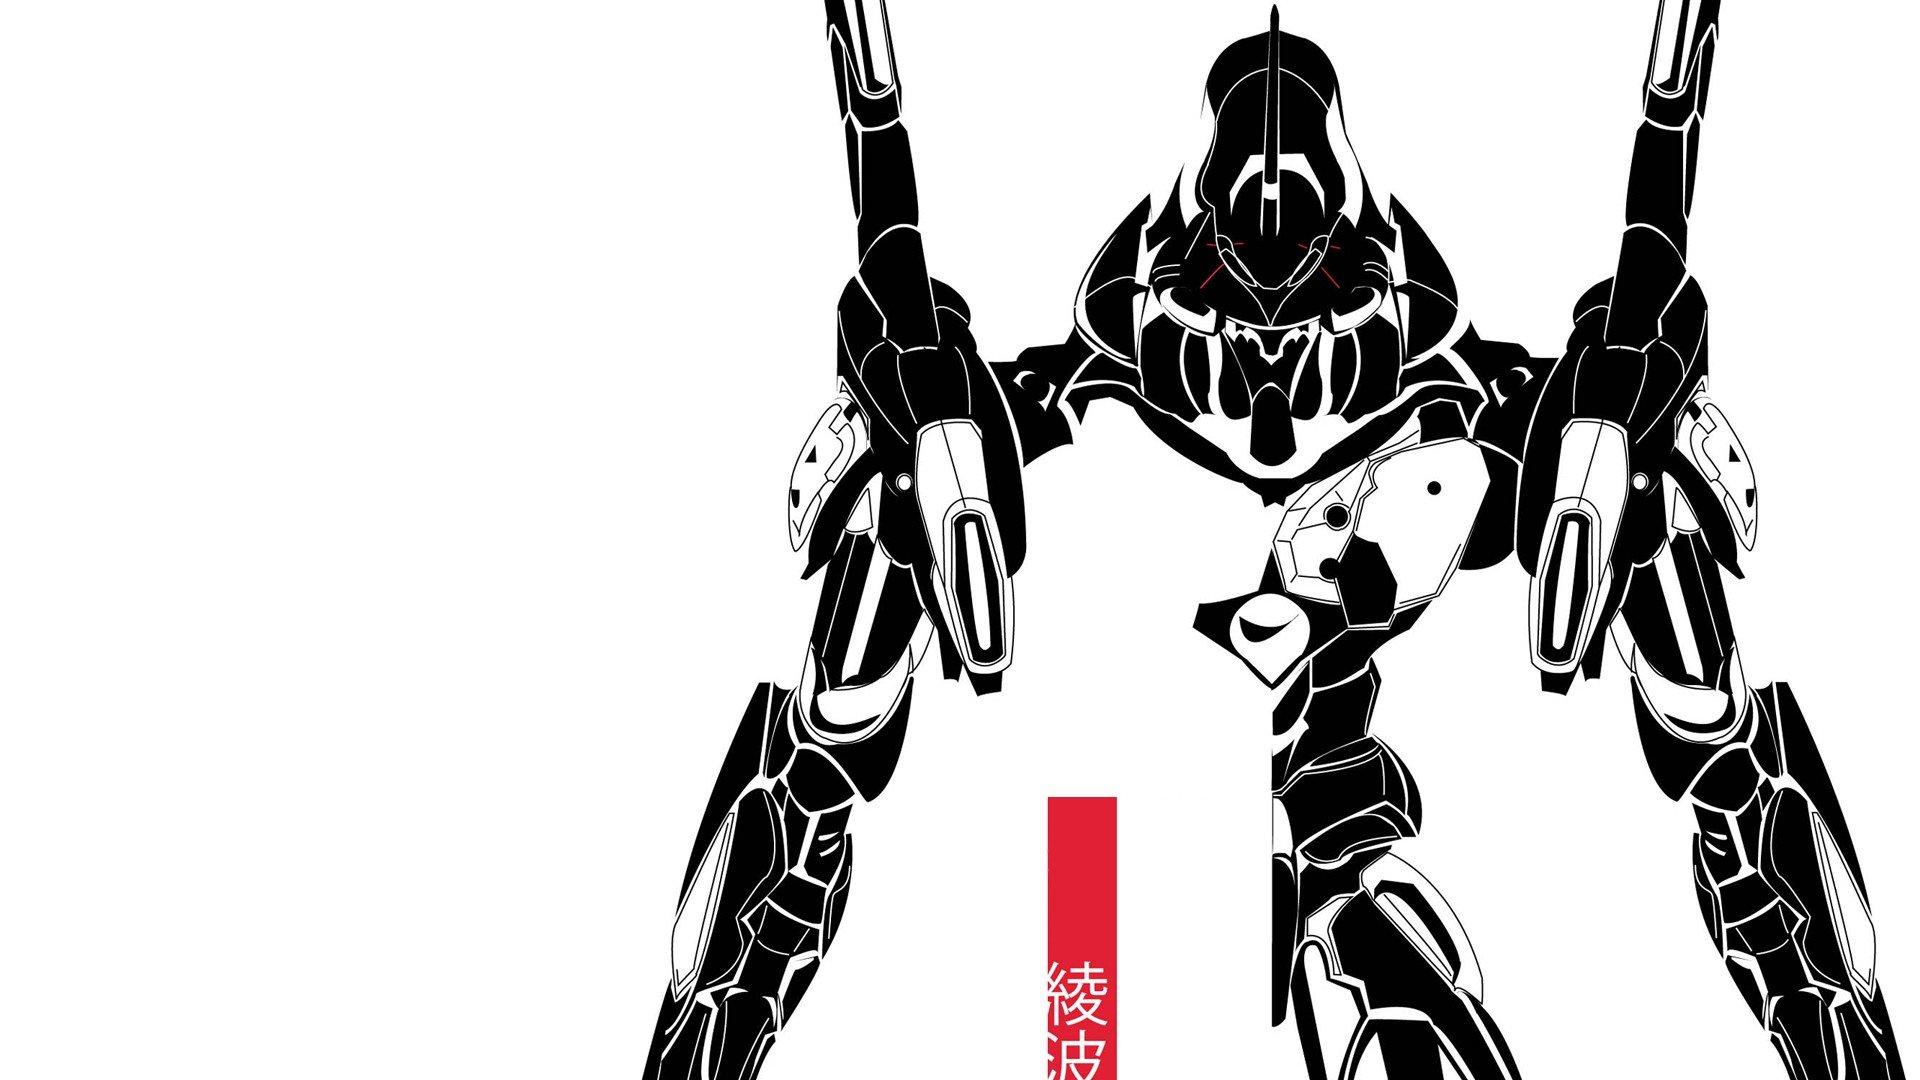 Download Full Hd Neon Genesis Evangelion Computer Wallpaper ID215411 For Free